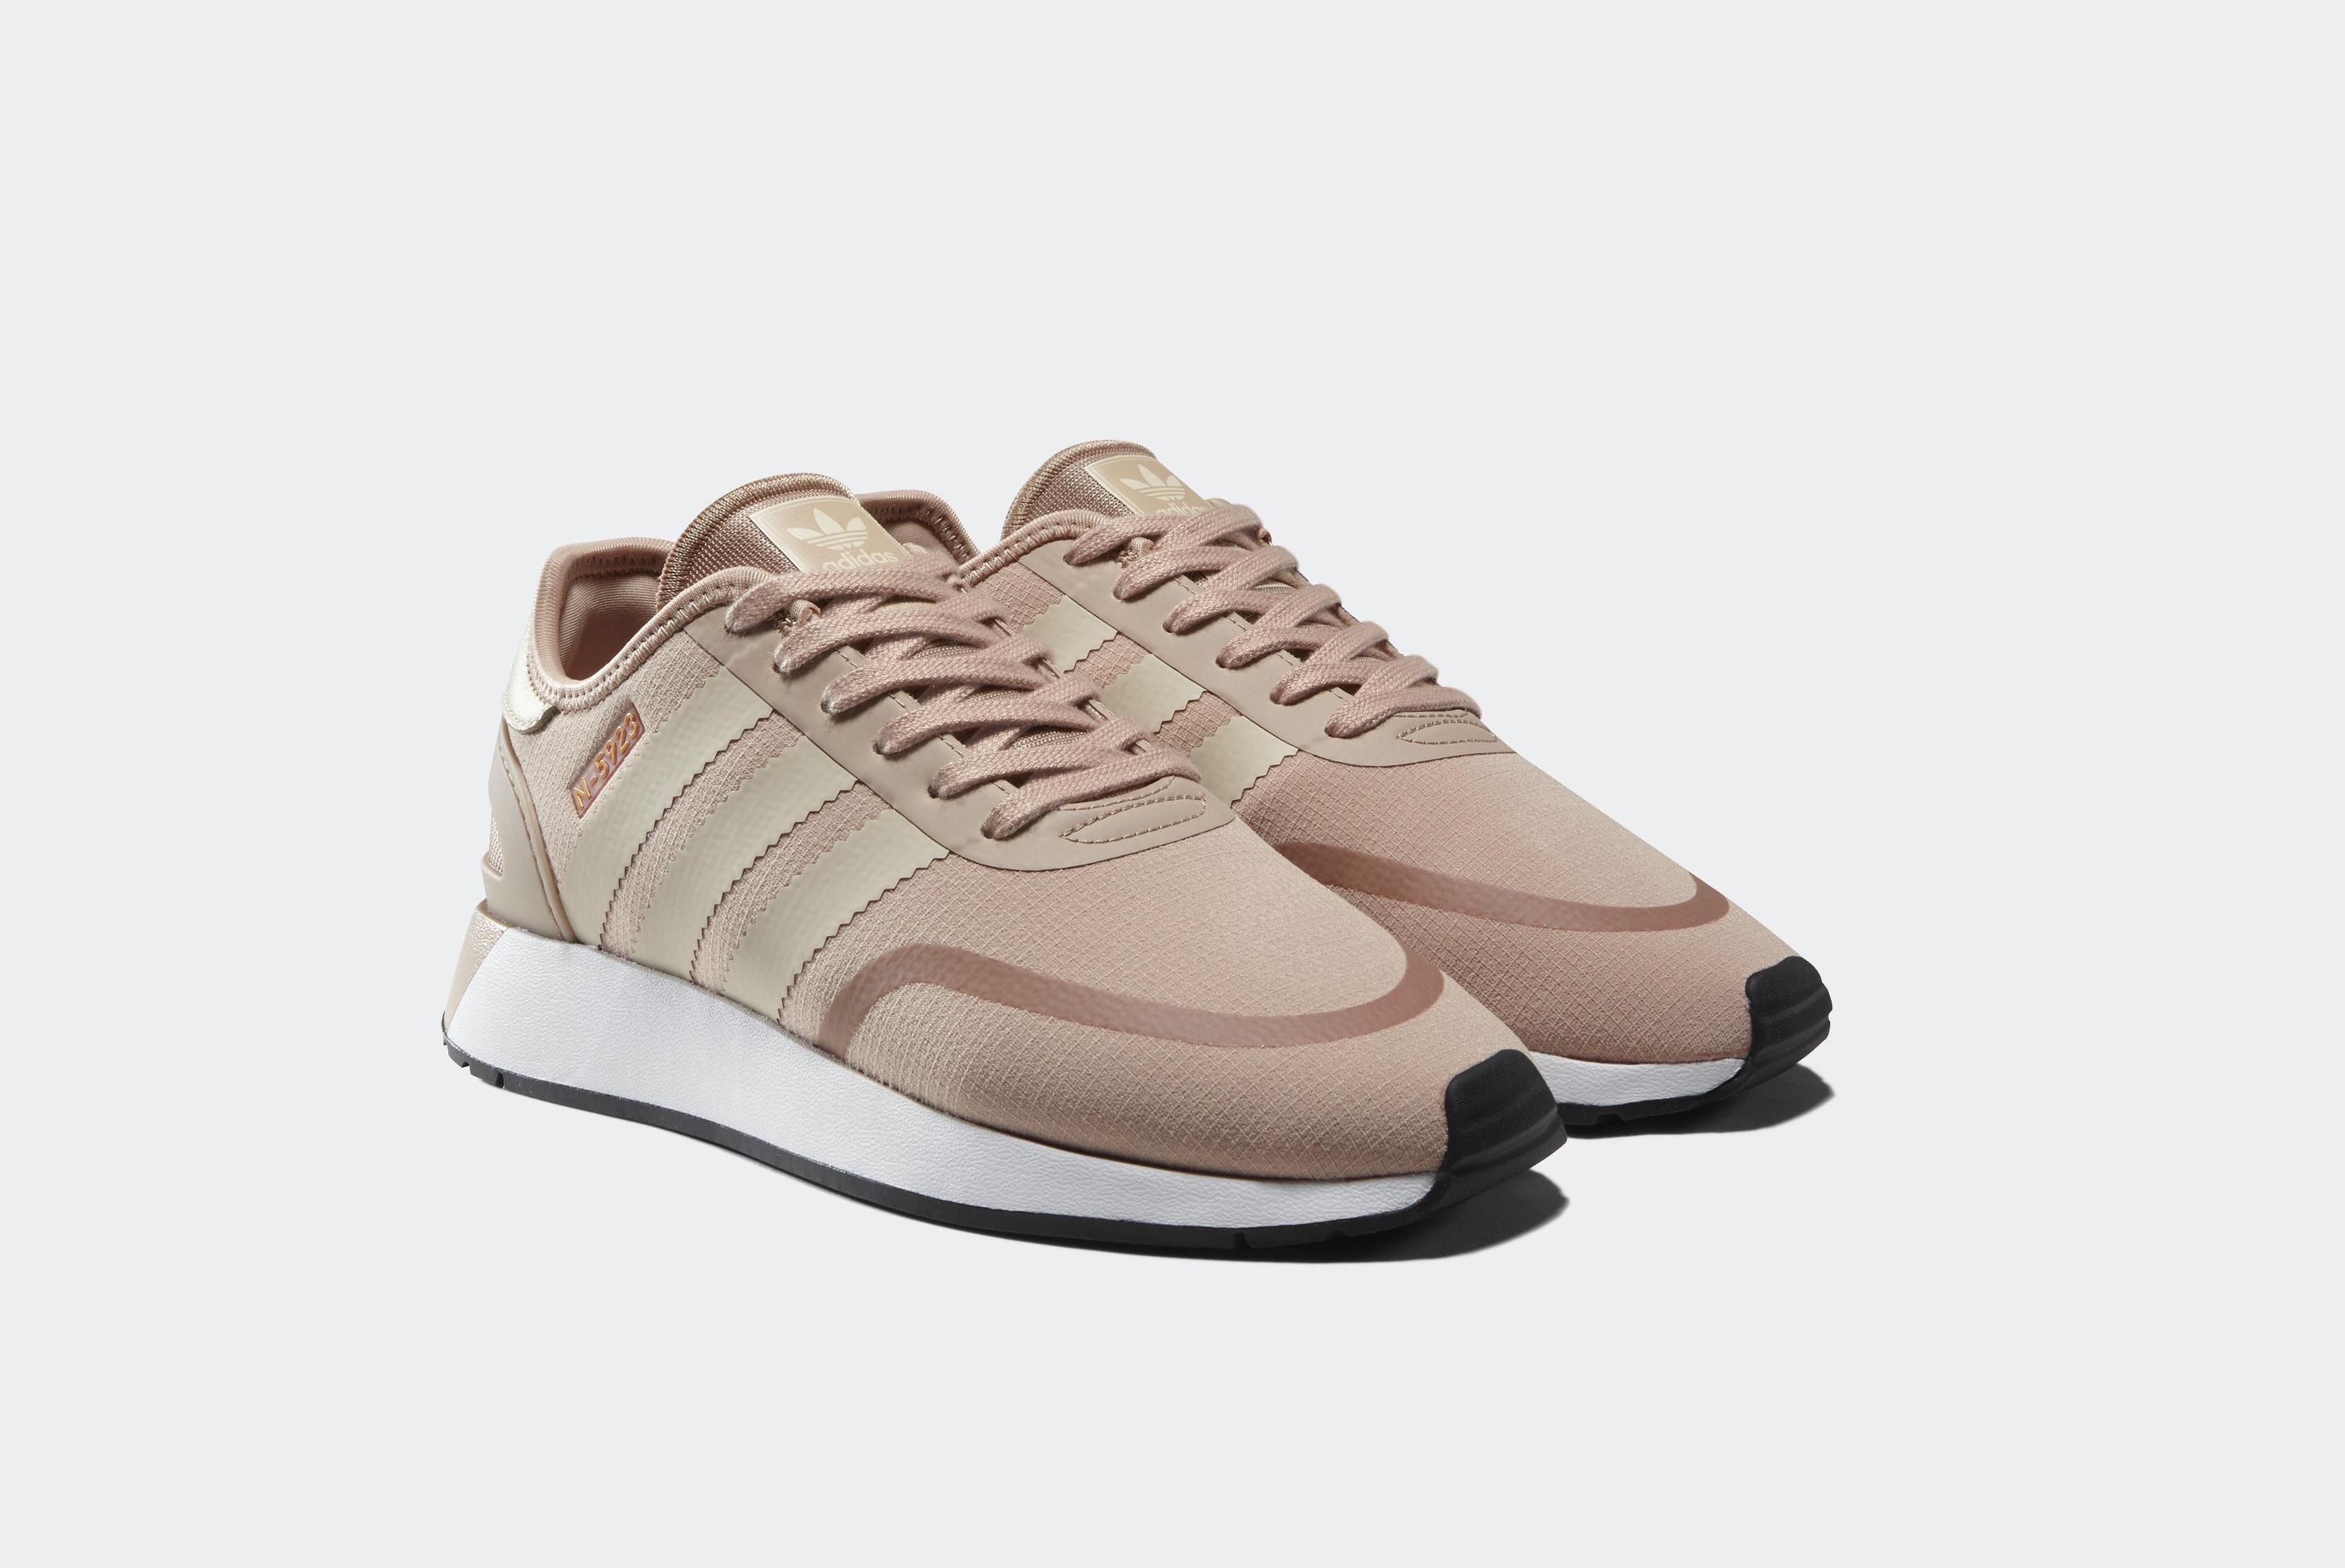 Adidas N 5923 3 E1521479545236 Sneaker Freaker